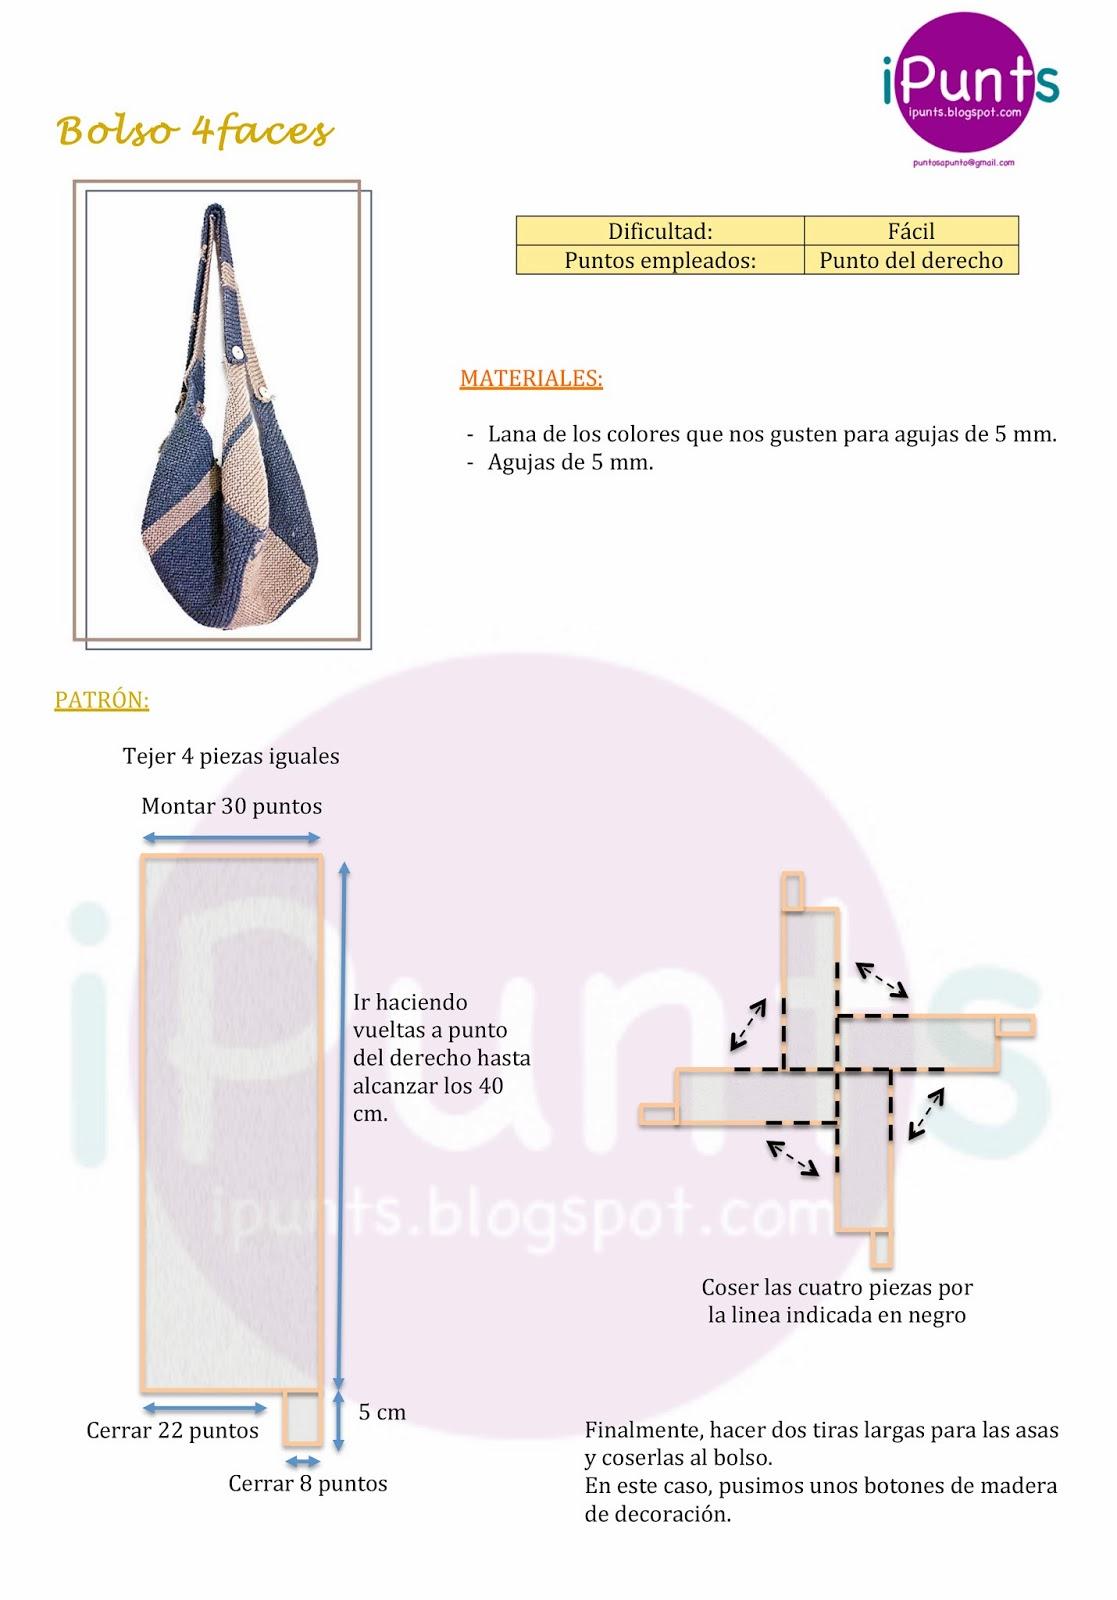 iPunts: Bolso 4faces